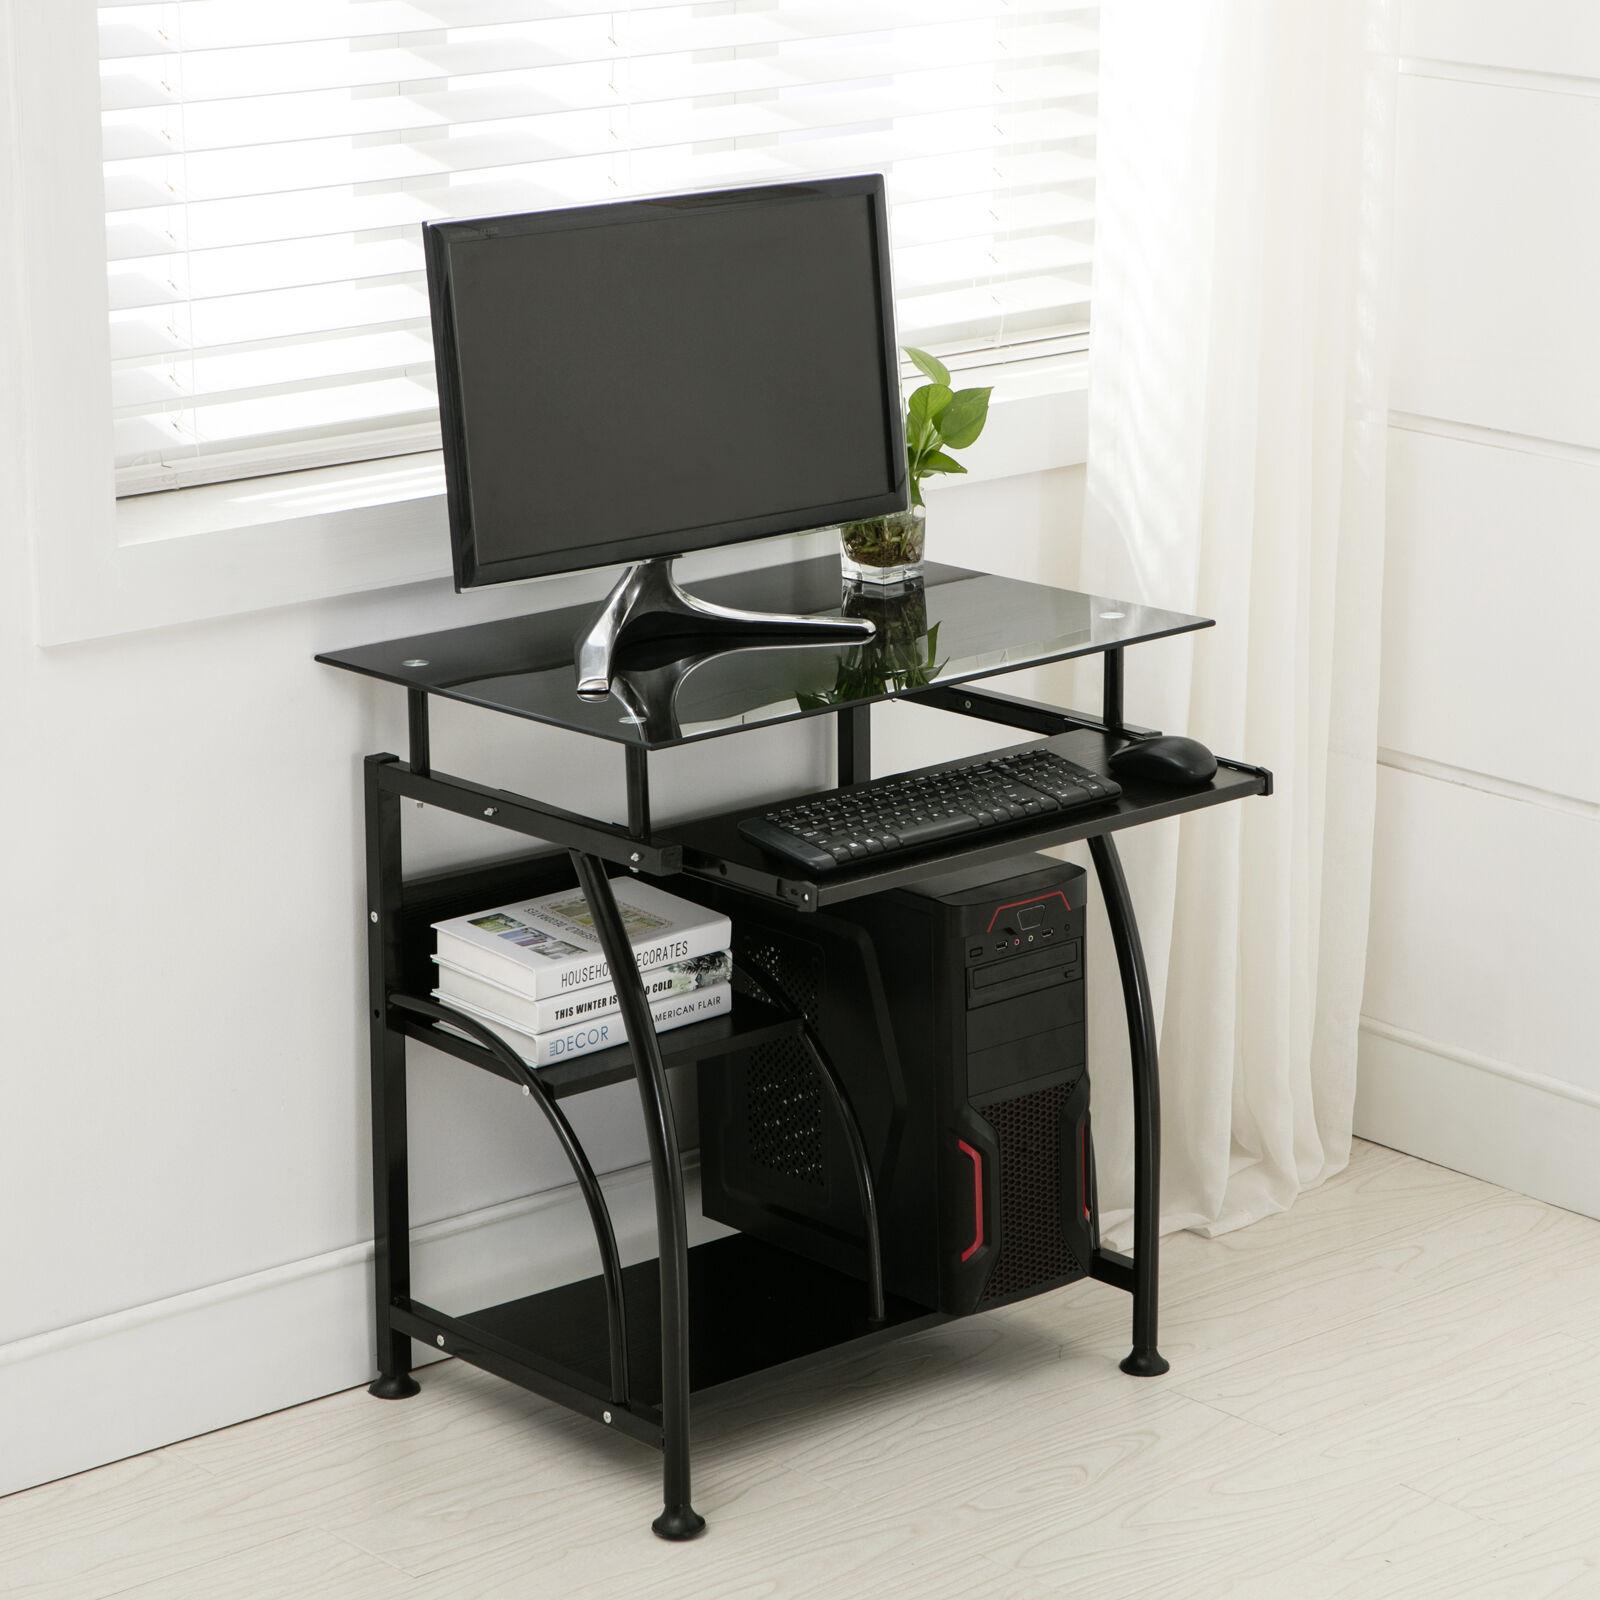 Black PC Corner Computer Desk Home Office Laptop Table